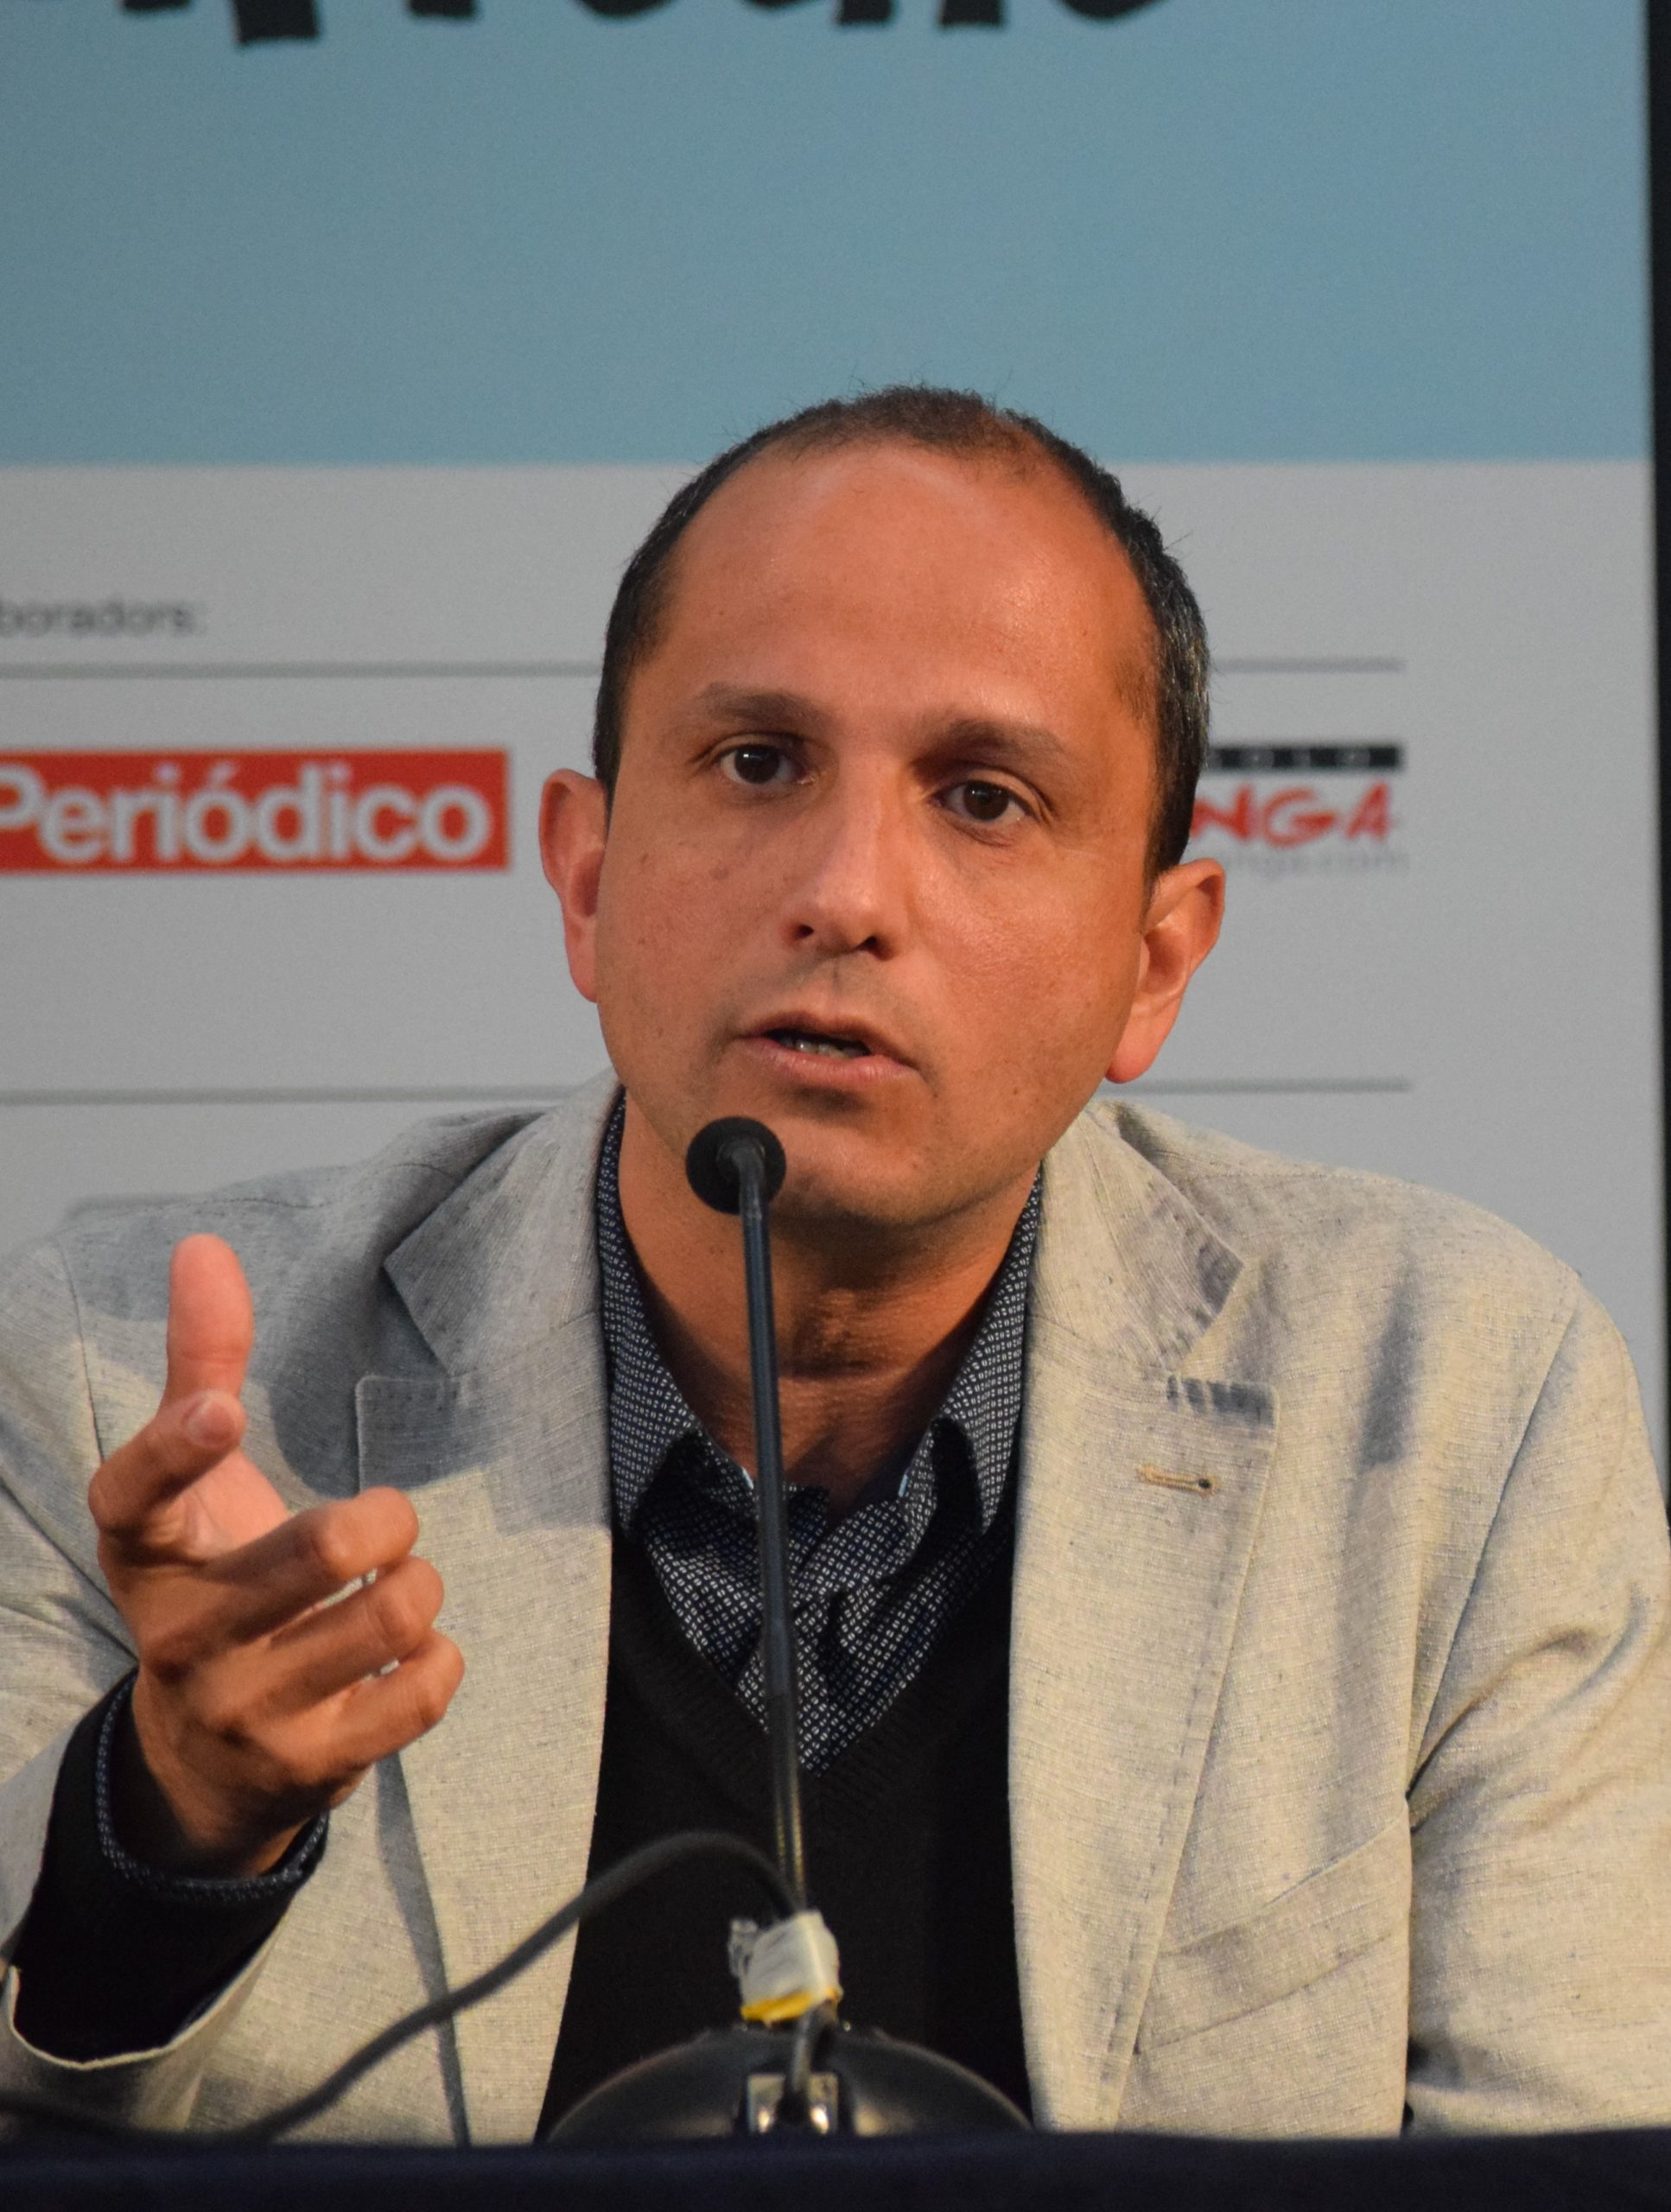 Contra Amazon: siete razones / Un manifiesto. Jorge Carrión en Jot Down